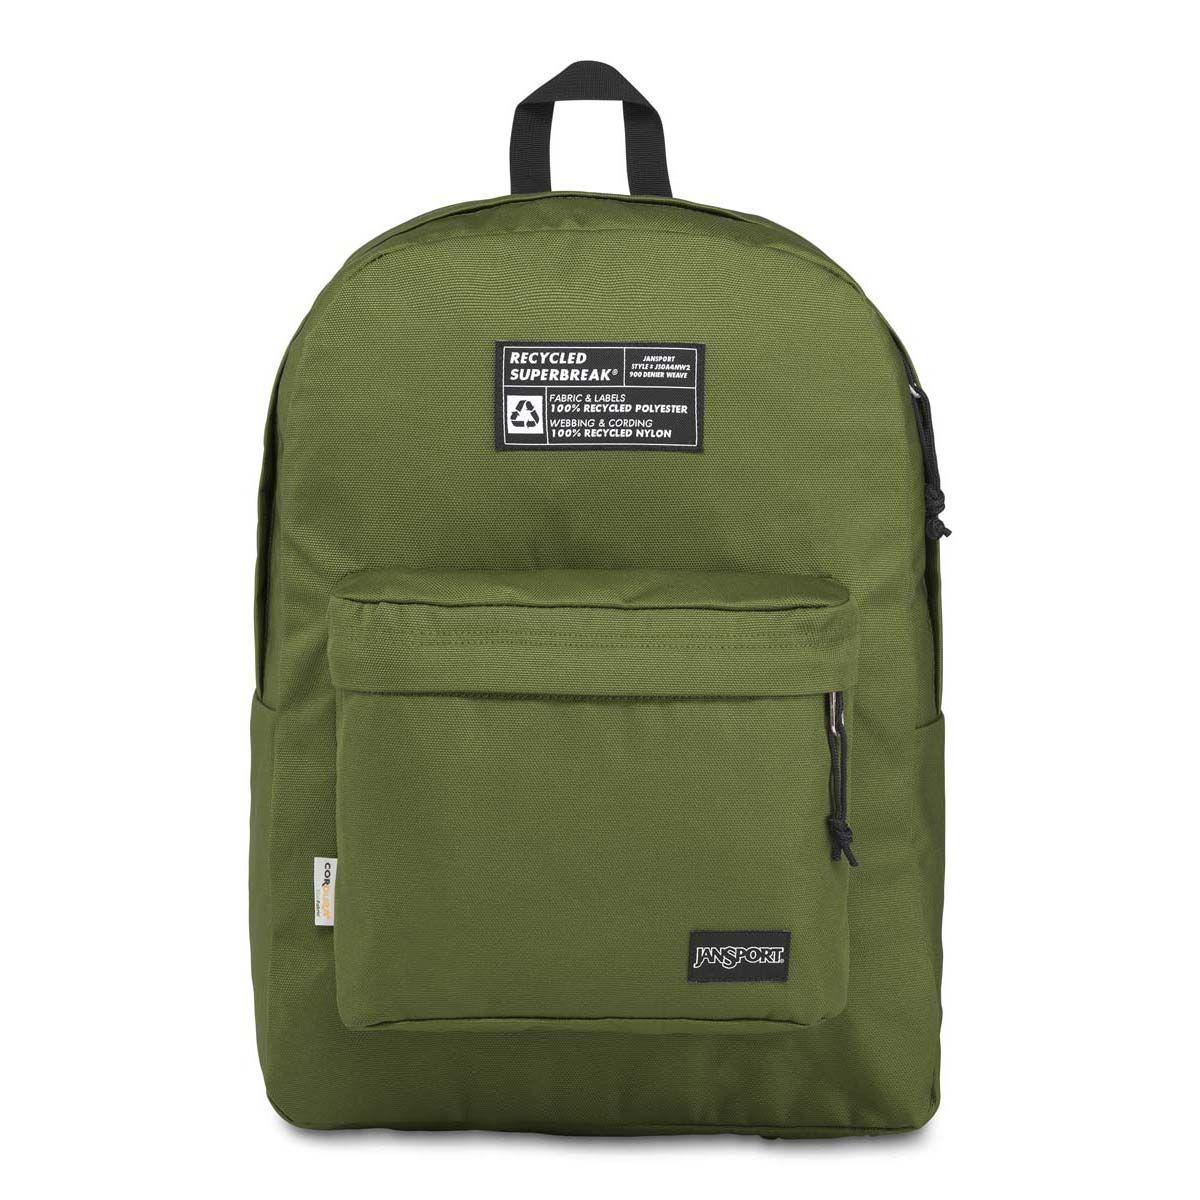 JanSport Recycled SuperBreak® Backpack in New Olive Green